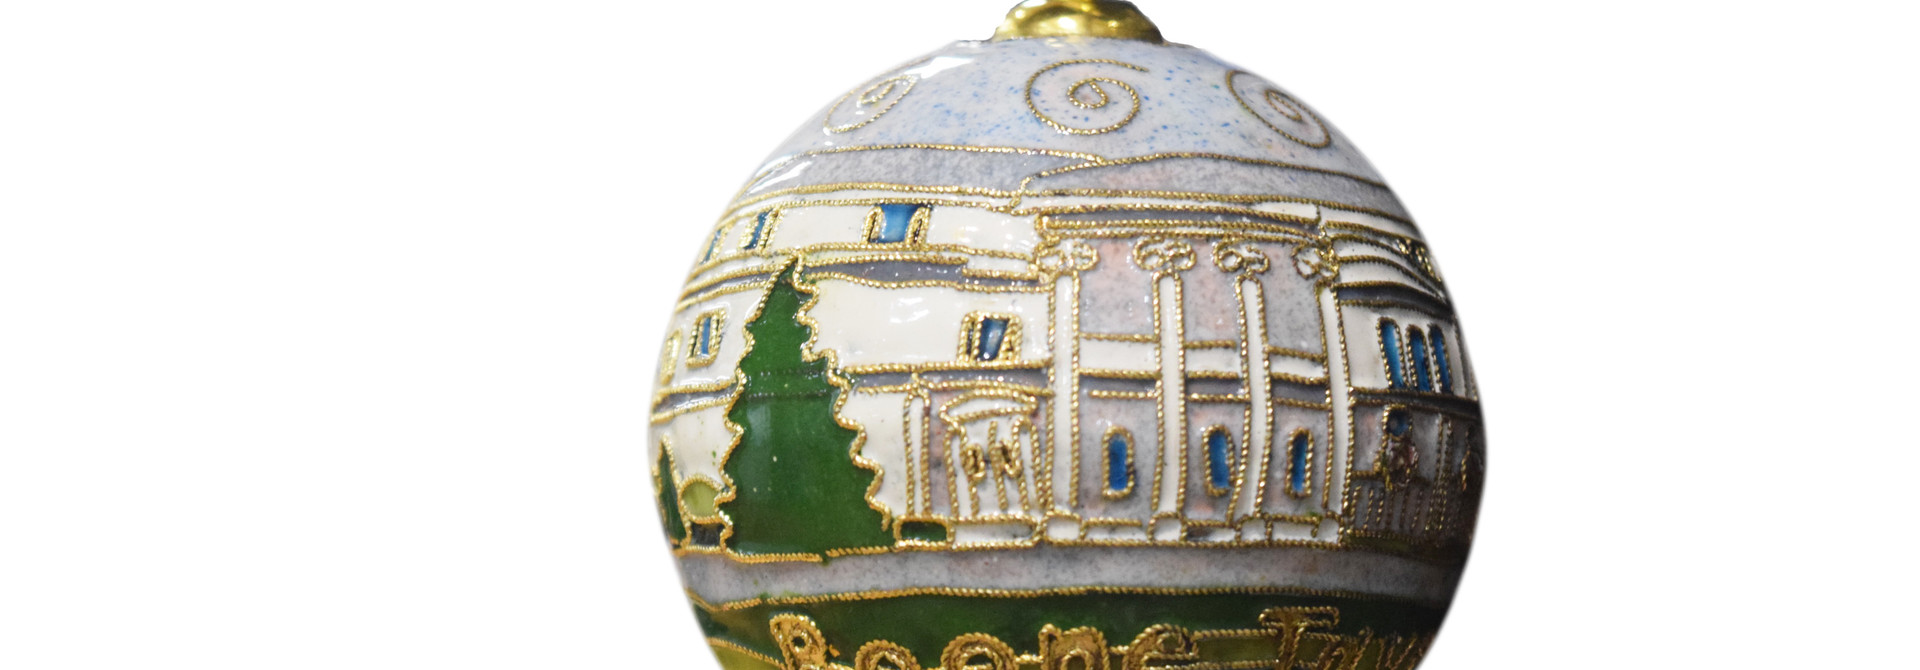 Berea College / Boone Tavern Ornament